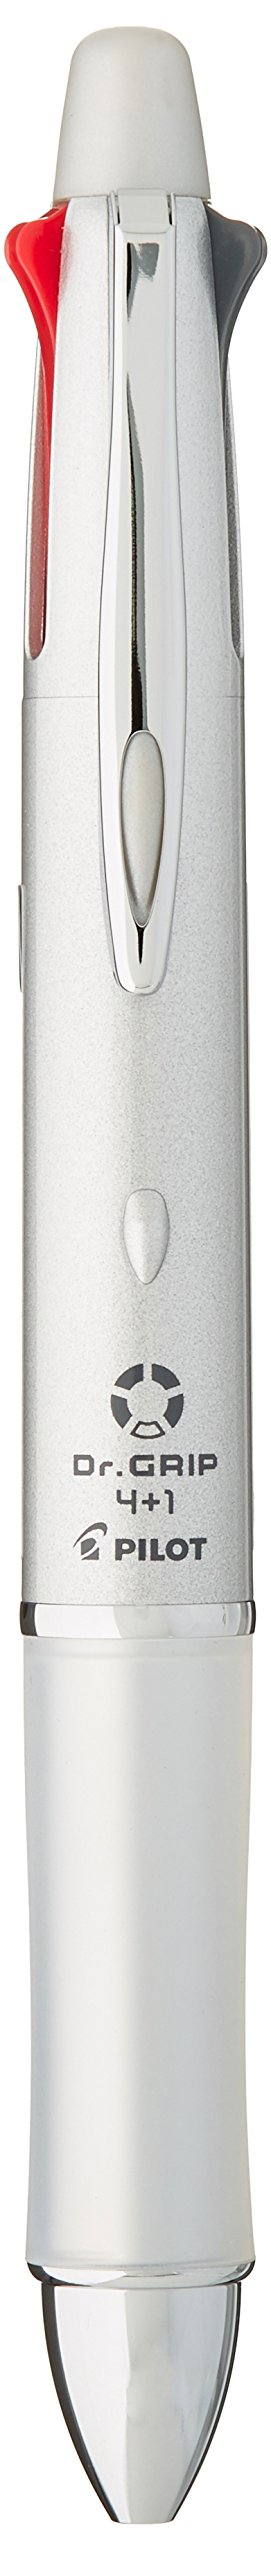 Pilot Mult Function Pen Dr. Grip 4+1, 0.7mm Acro Ink Ballpoint Pen, 0.5mm Mechanical Pencil, Silver (BKHDF1SF-SP) by Pilot